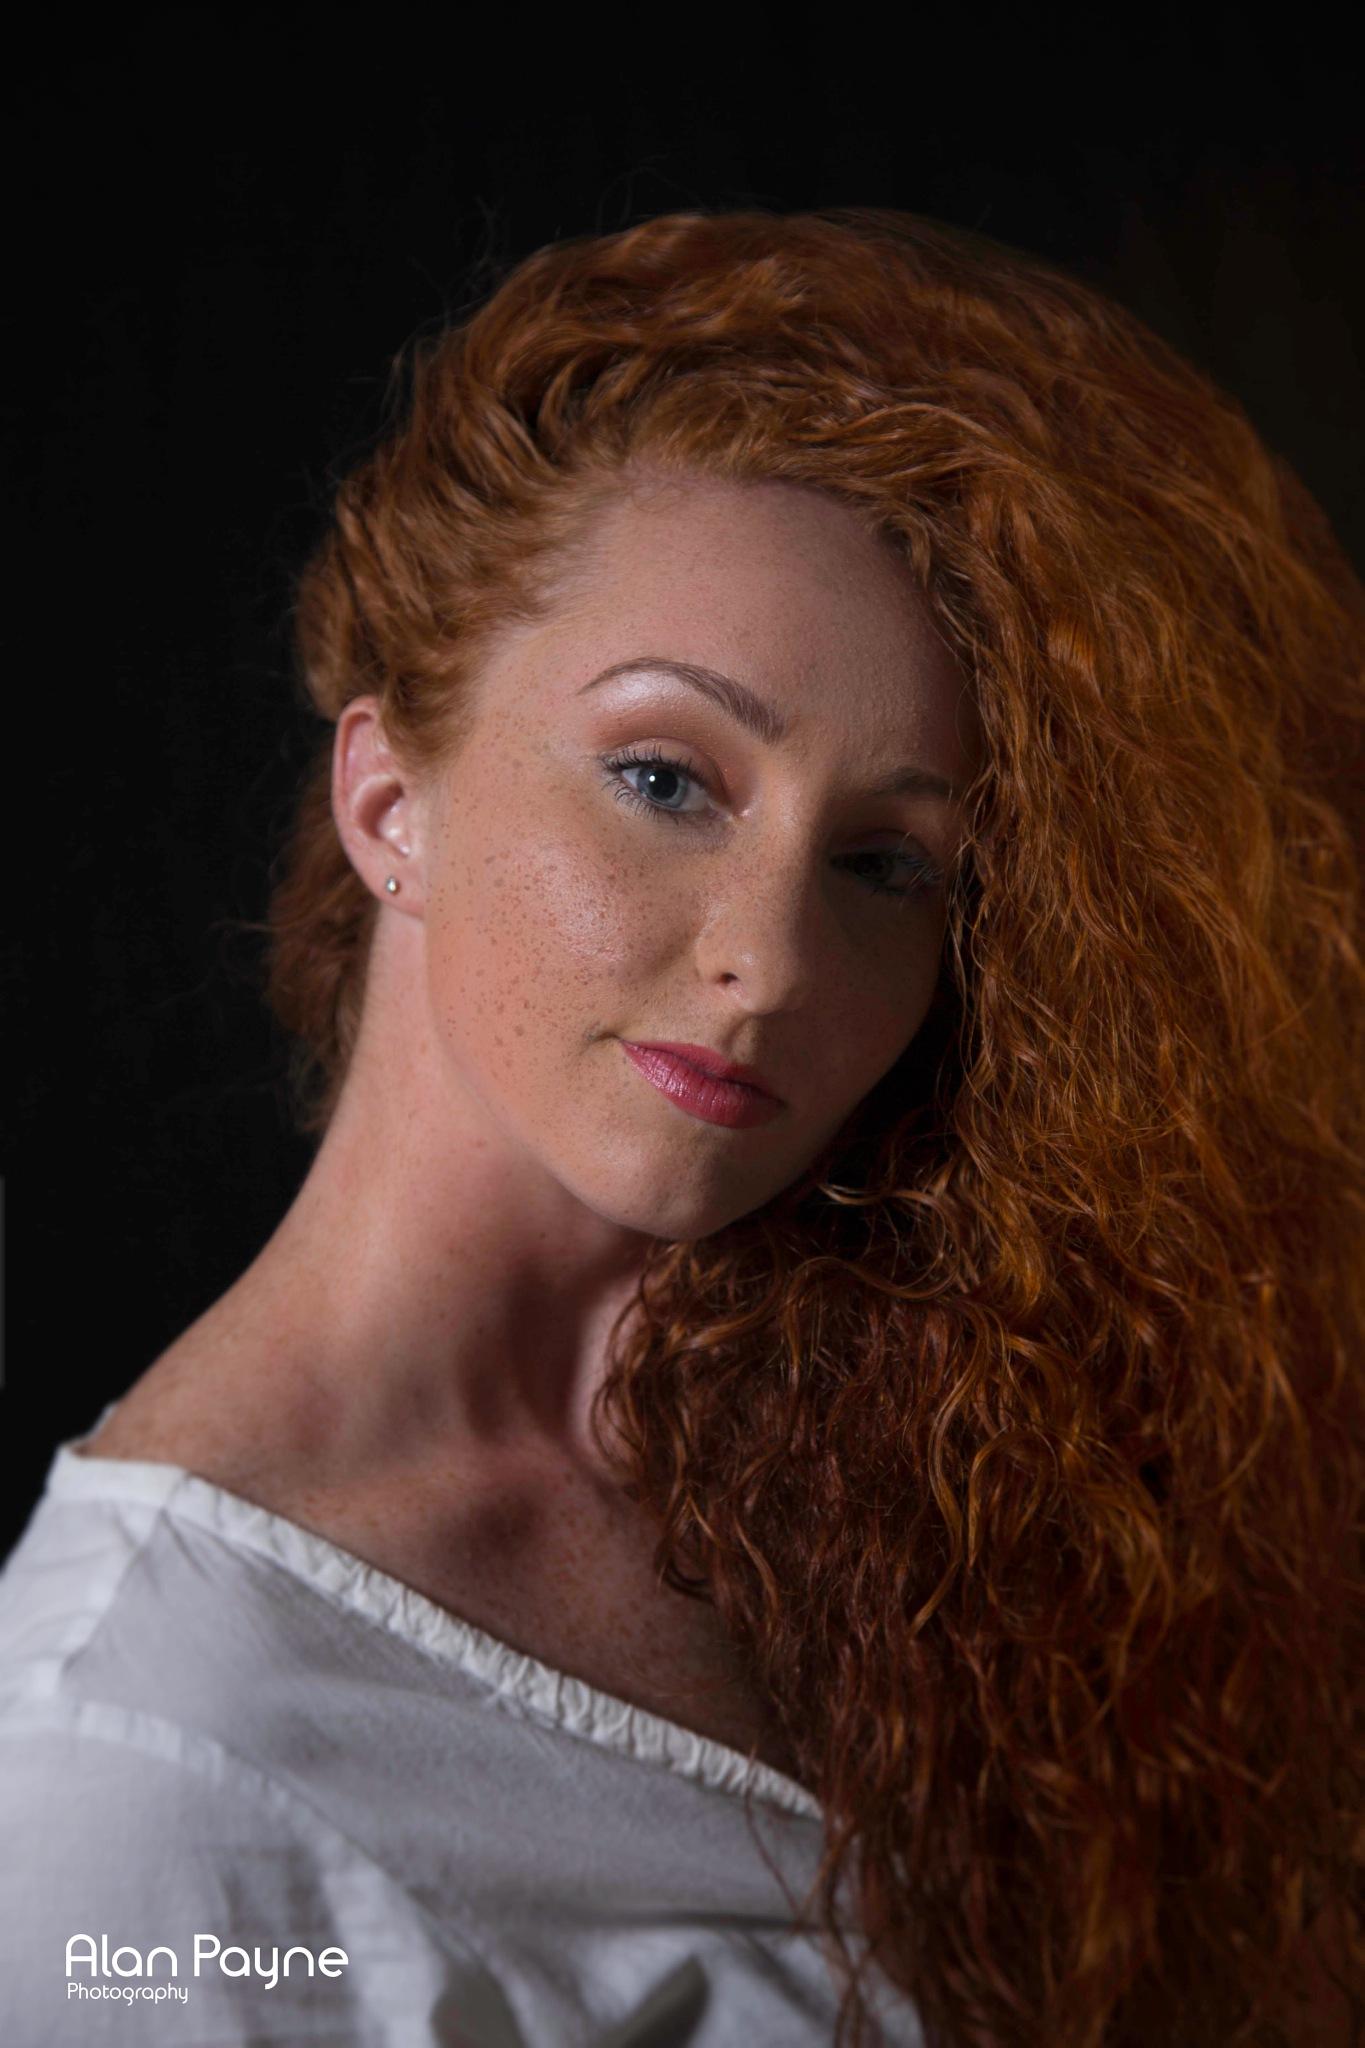 Red hair and freckles by alanpayne_fizzylemonstudio